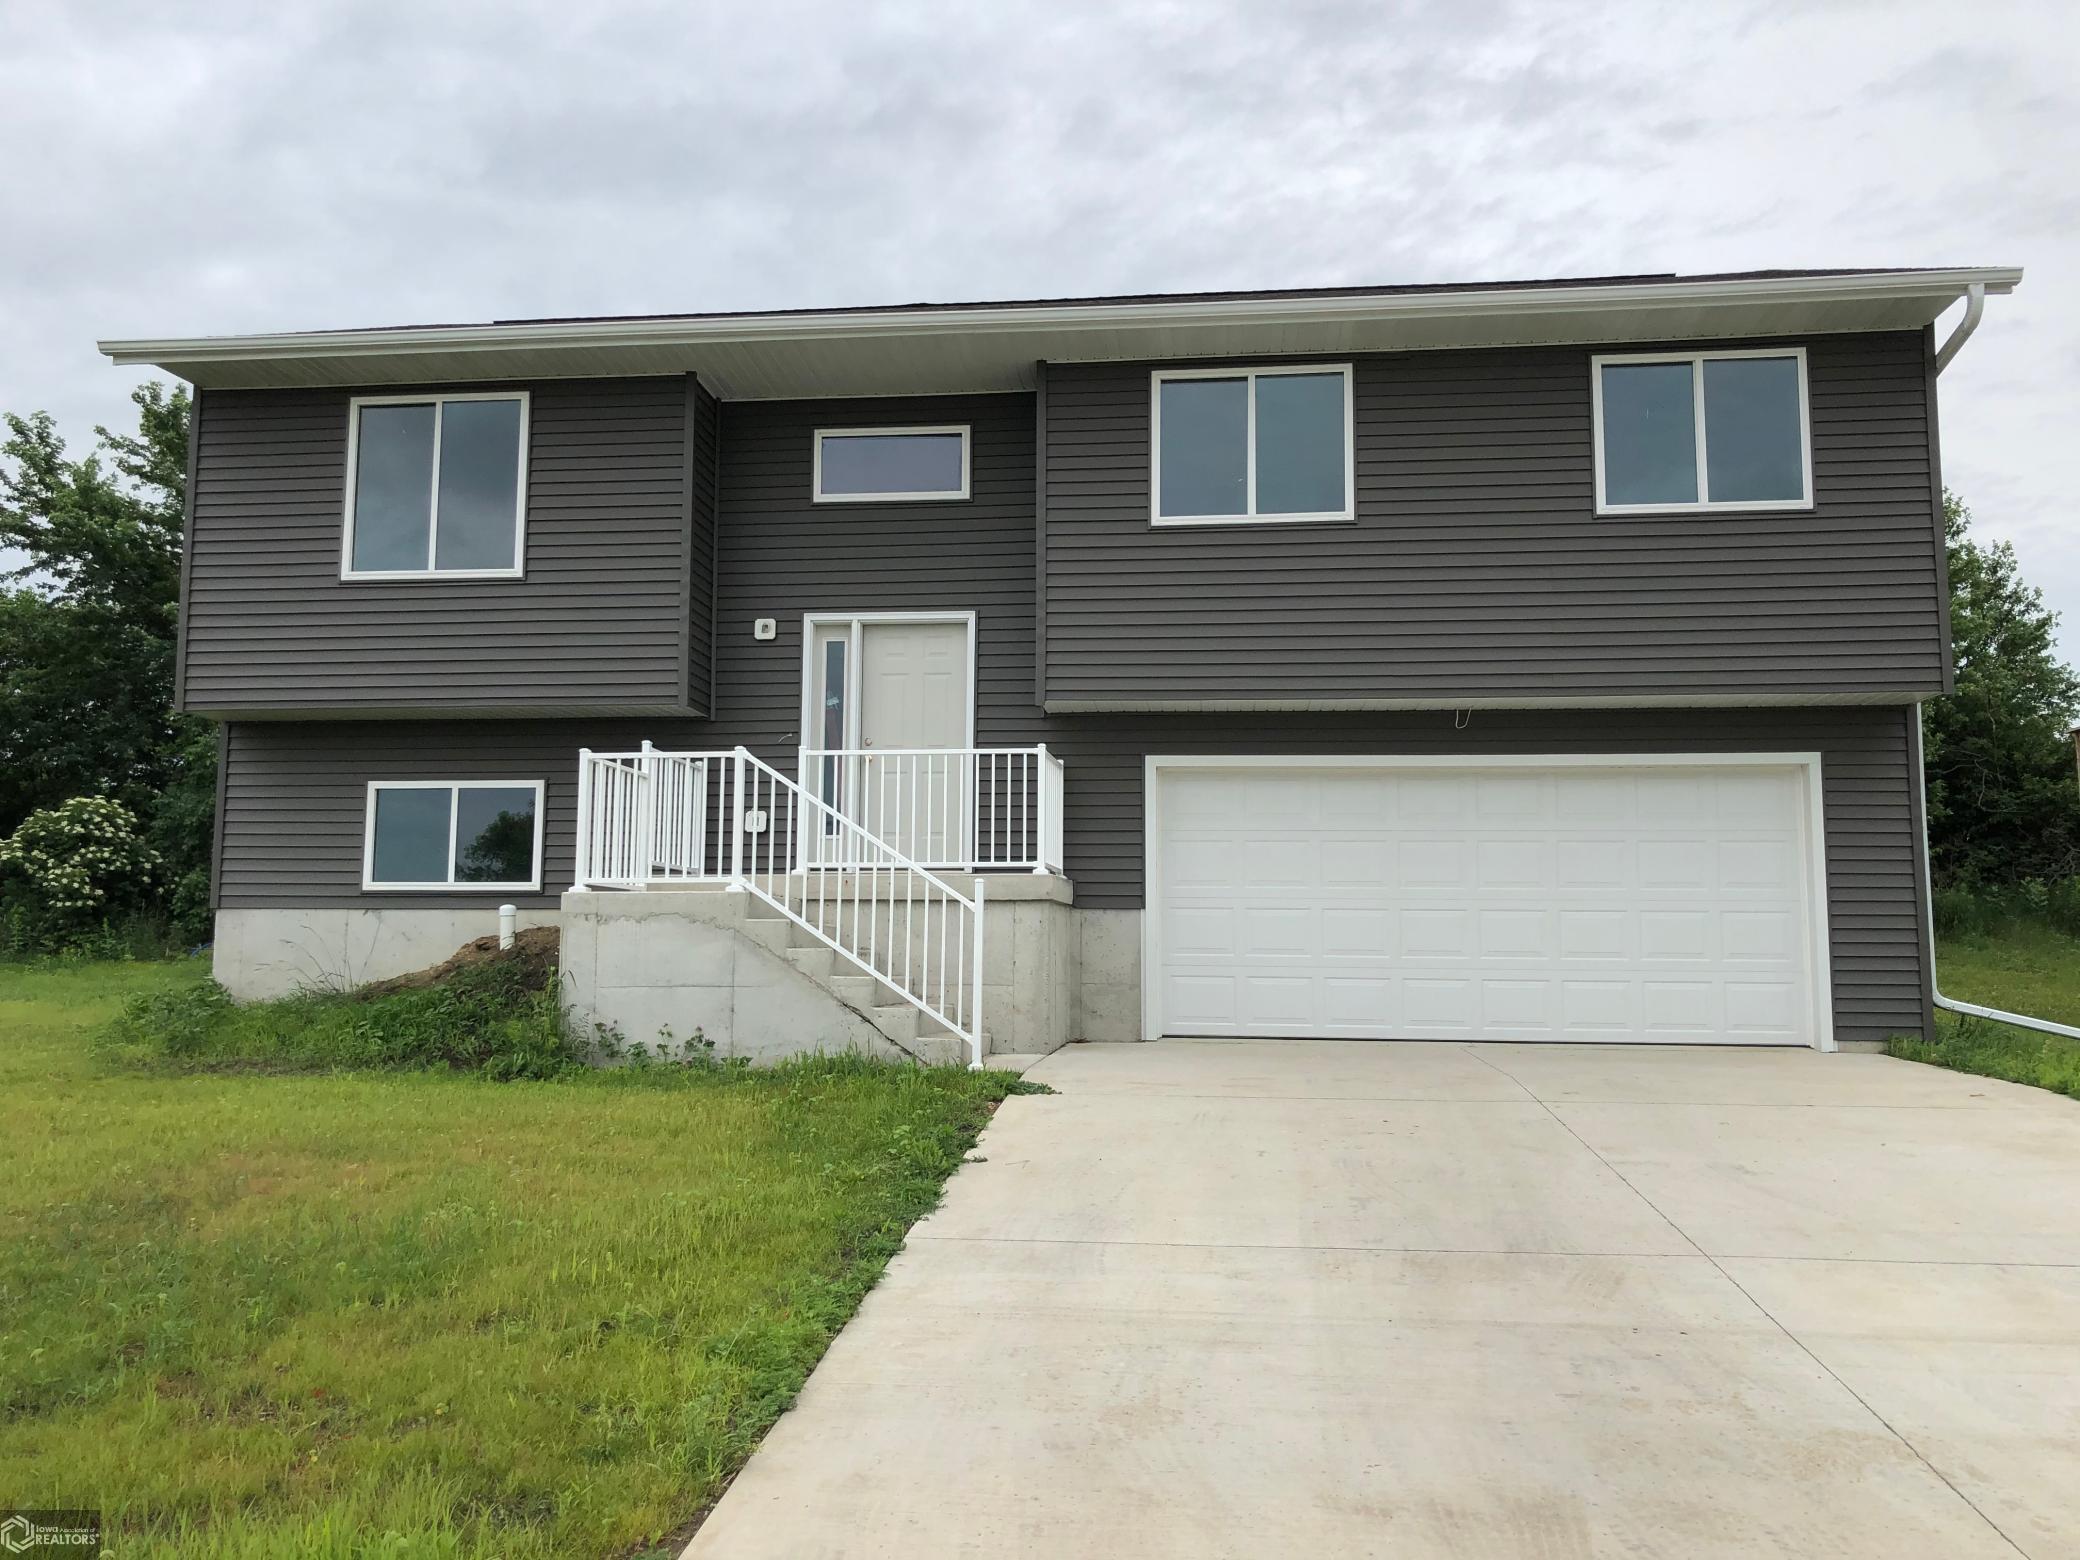 1104 Mockingbird Property Photo - Carroll, IA real estate listing